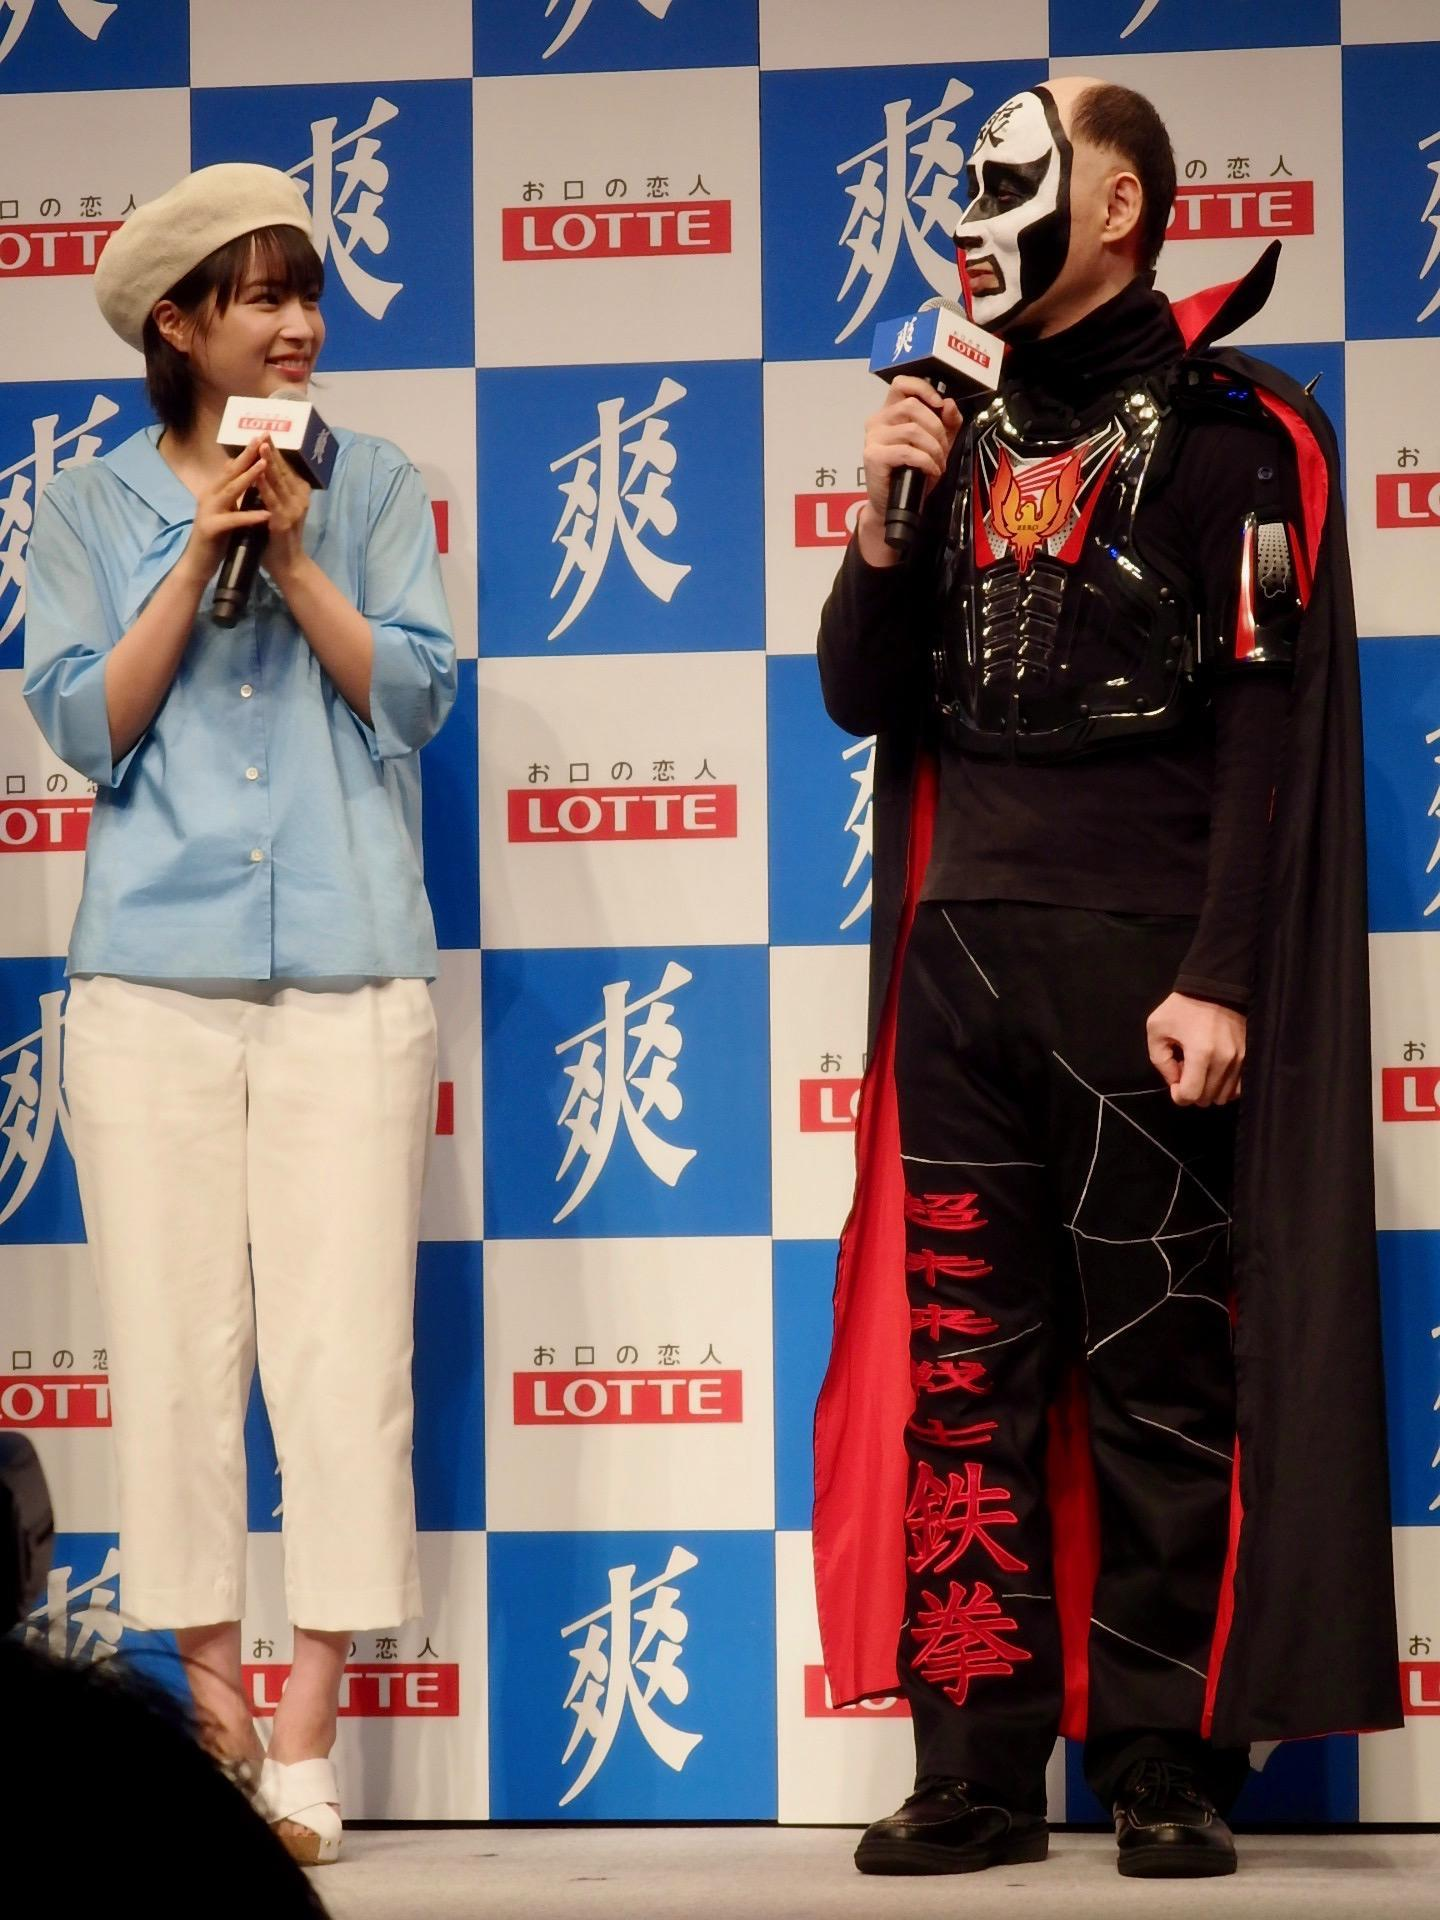 http://news.yoshimoto.co.jp/20180612212021-5ba40a2ac99768126d6875627c242df27dce4a43.jpg